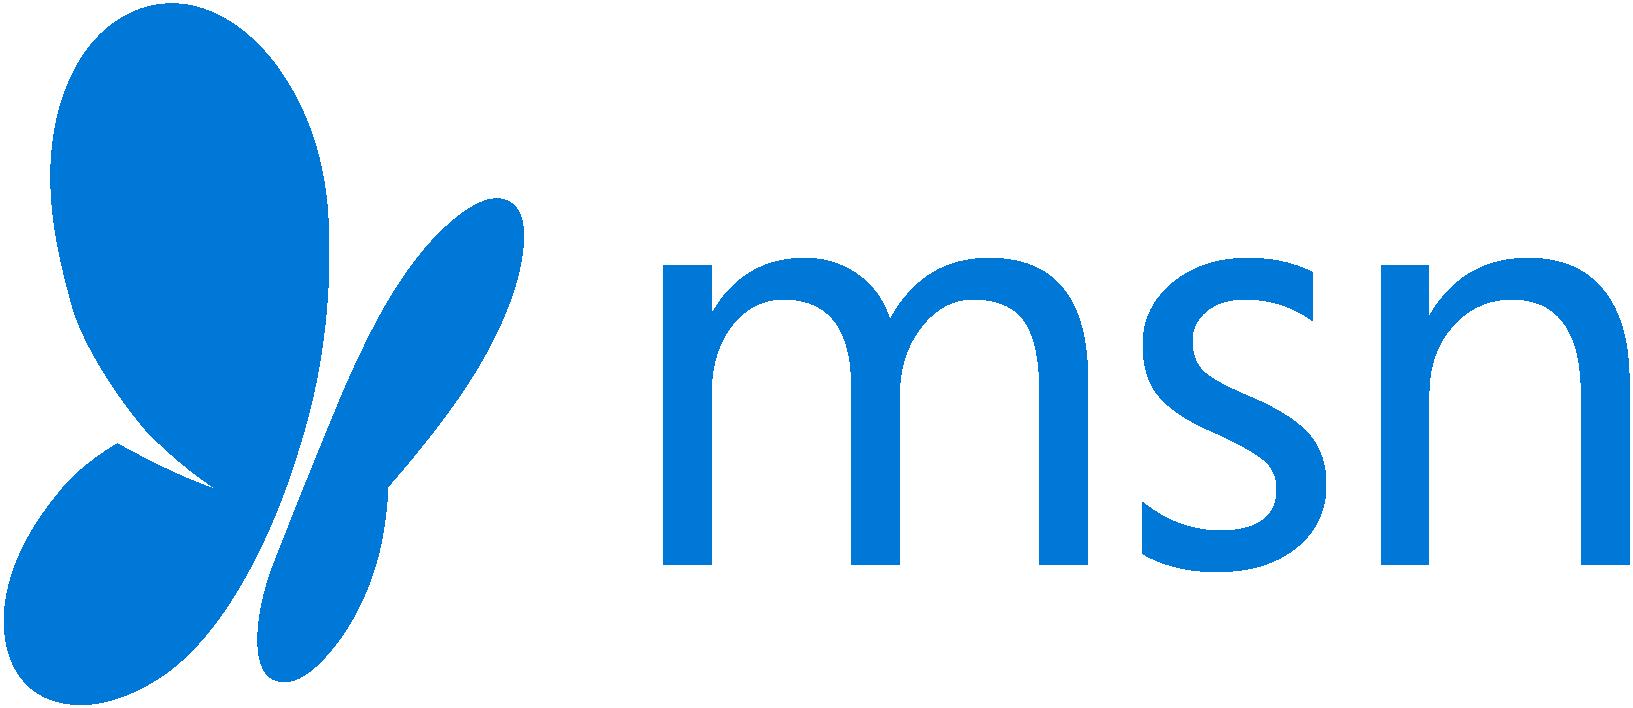 February 21, 2018  Bosch Acquires Ride-Sharing Startup SPLT